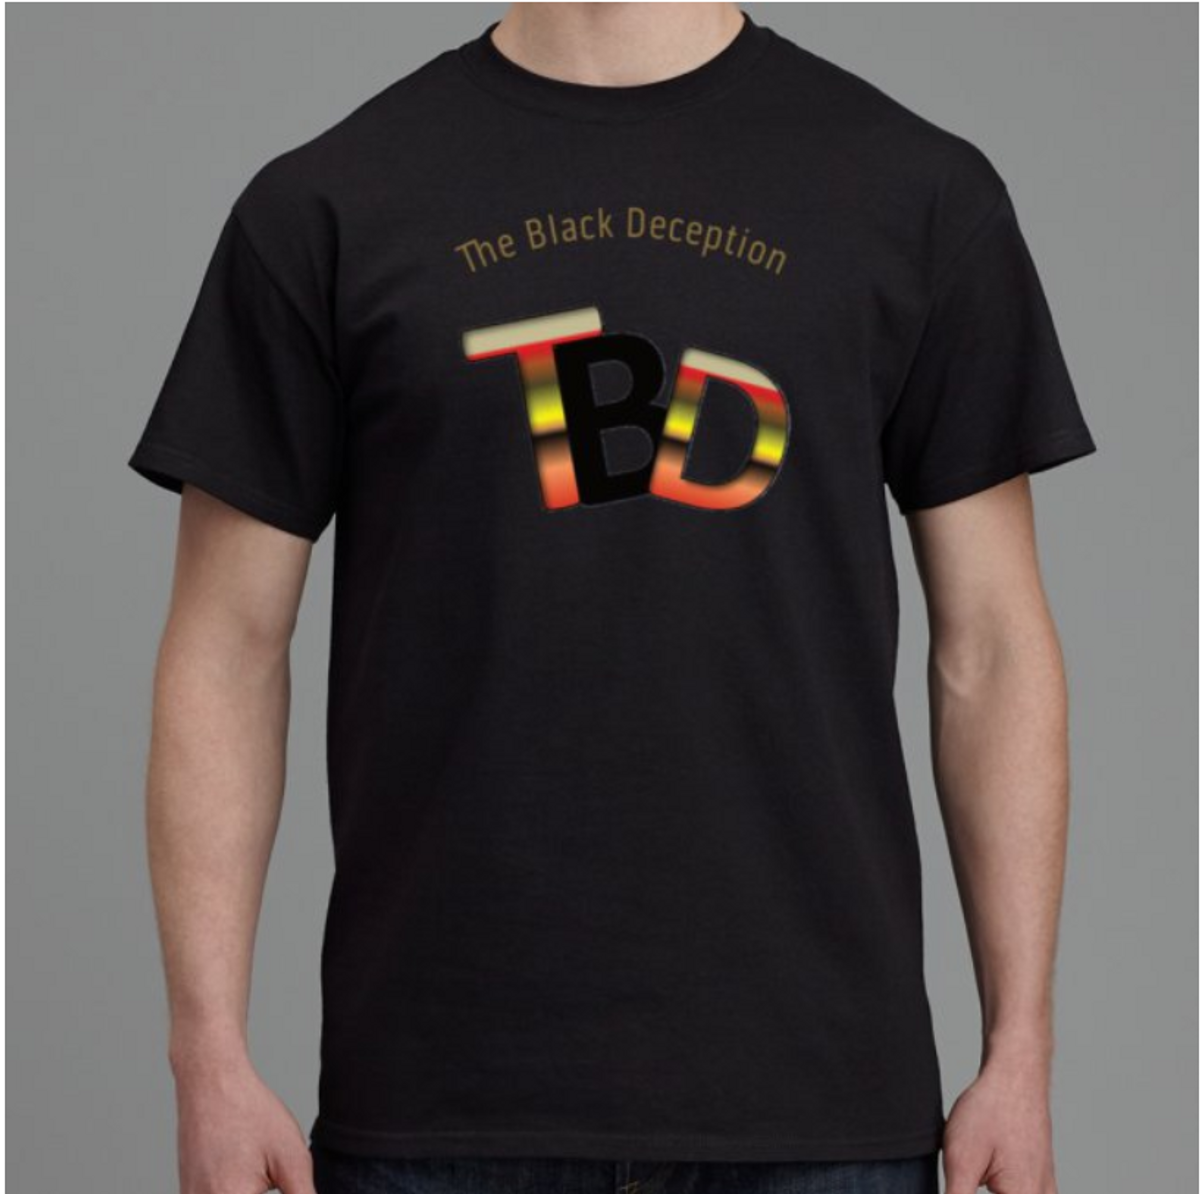 The Black Deception Tshirt